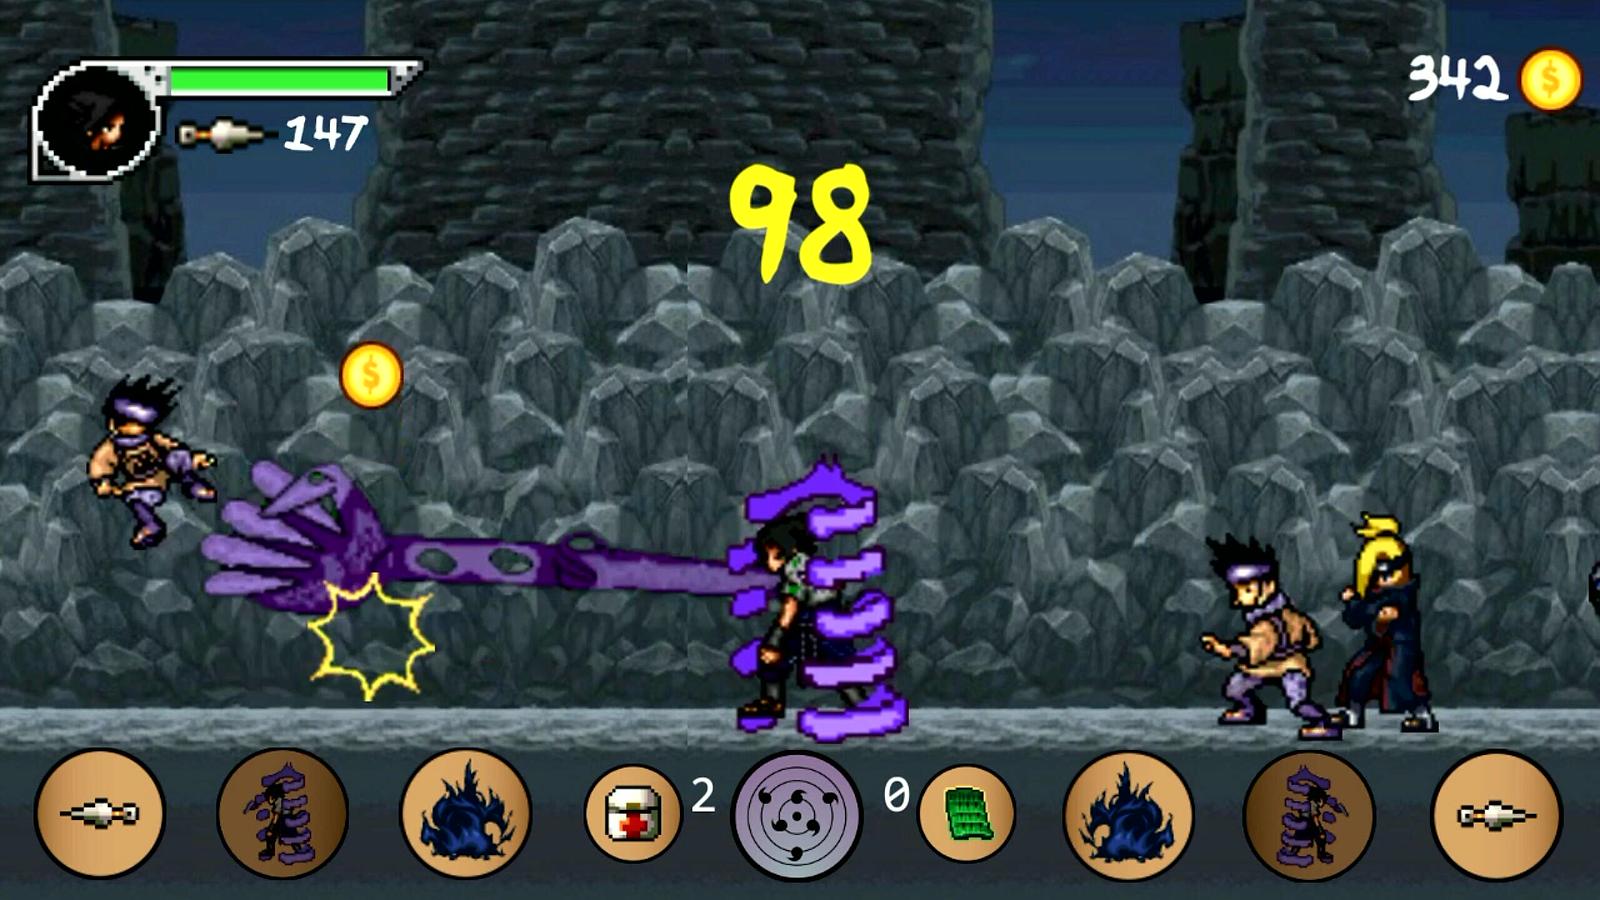 naruto ninja anime battle 5 apk download